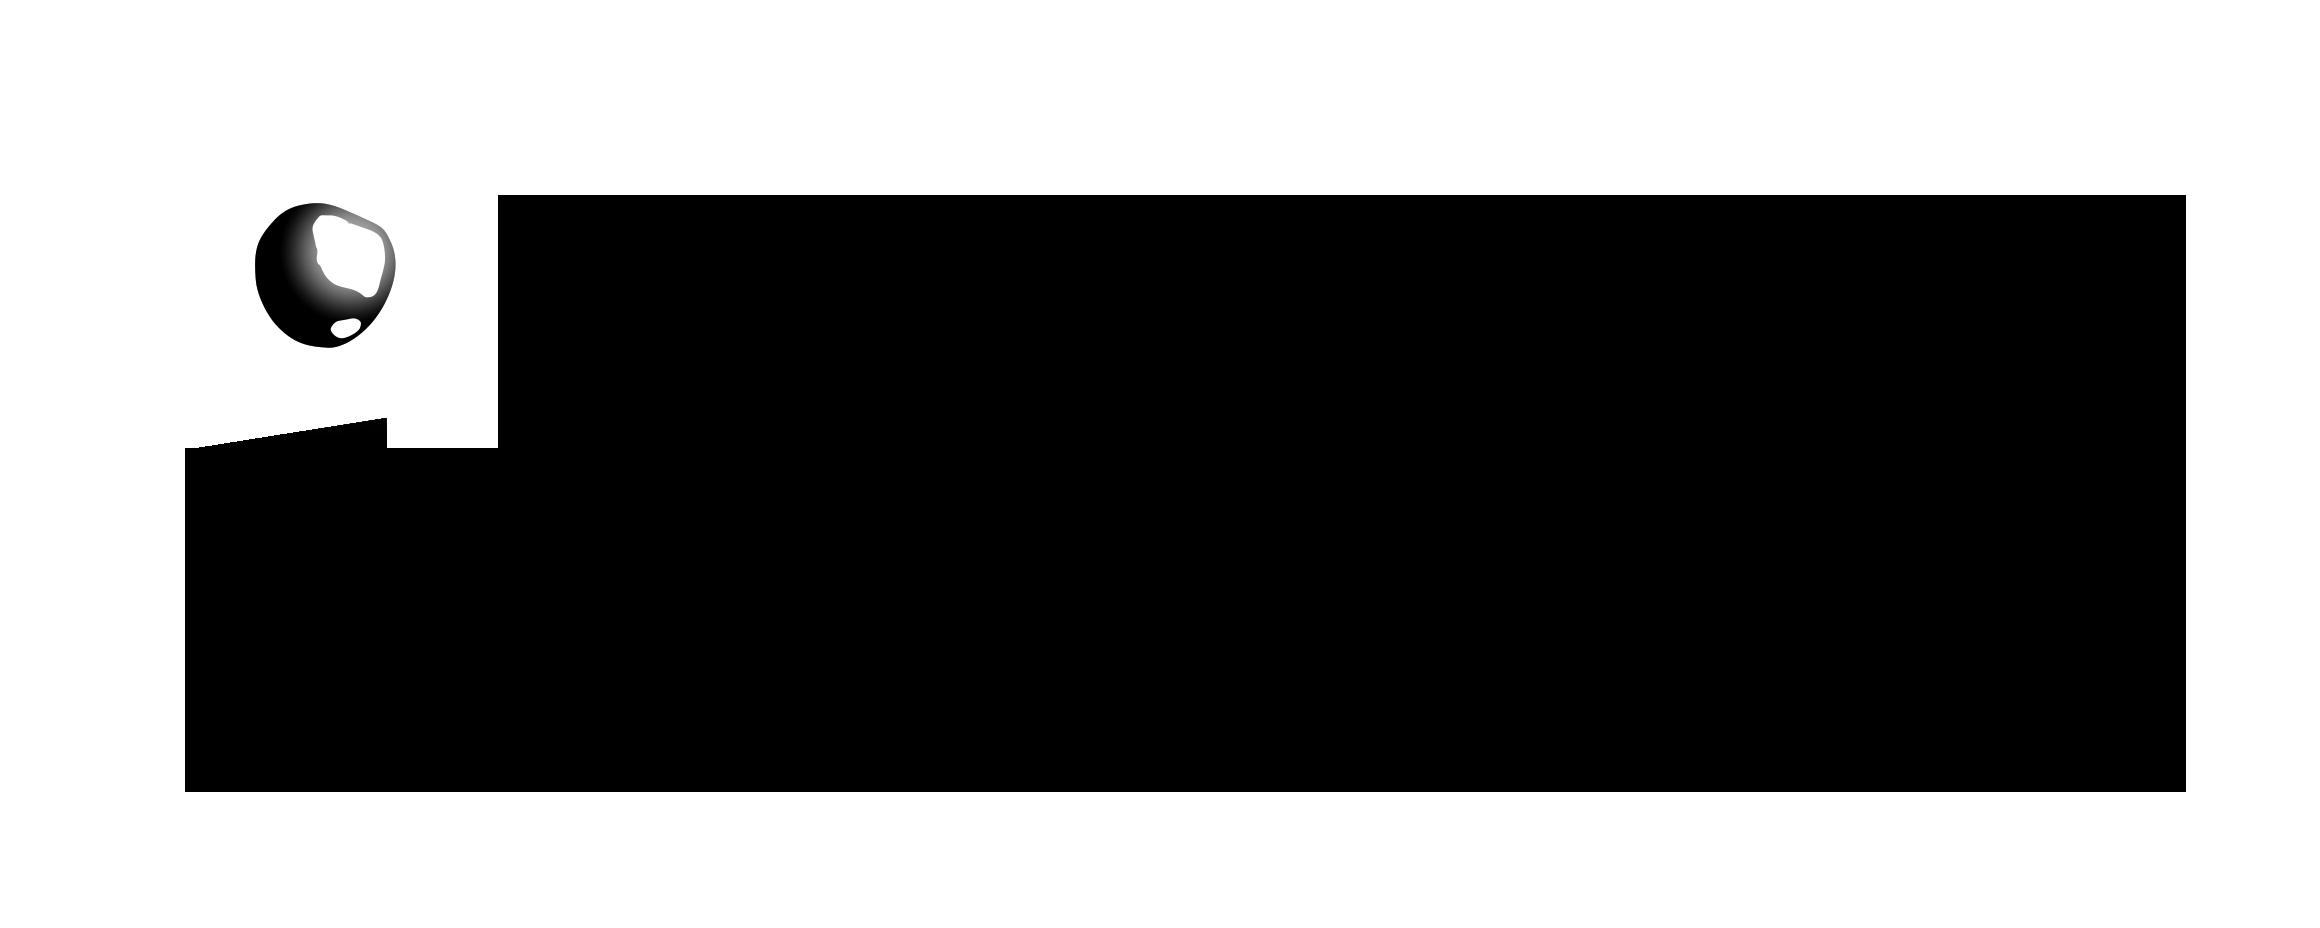 Image result for inkle game development